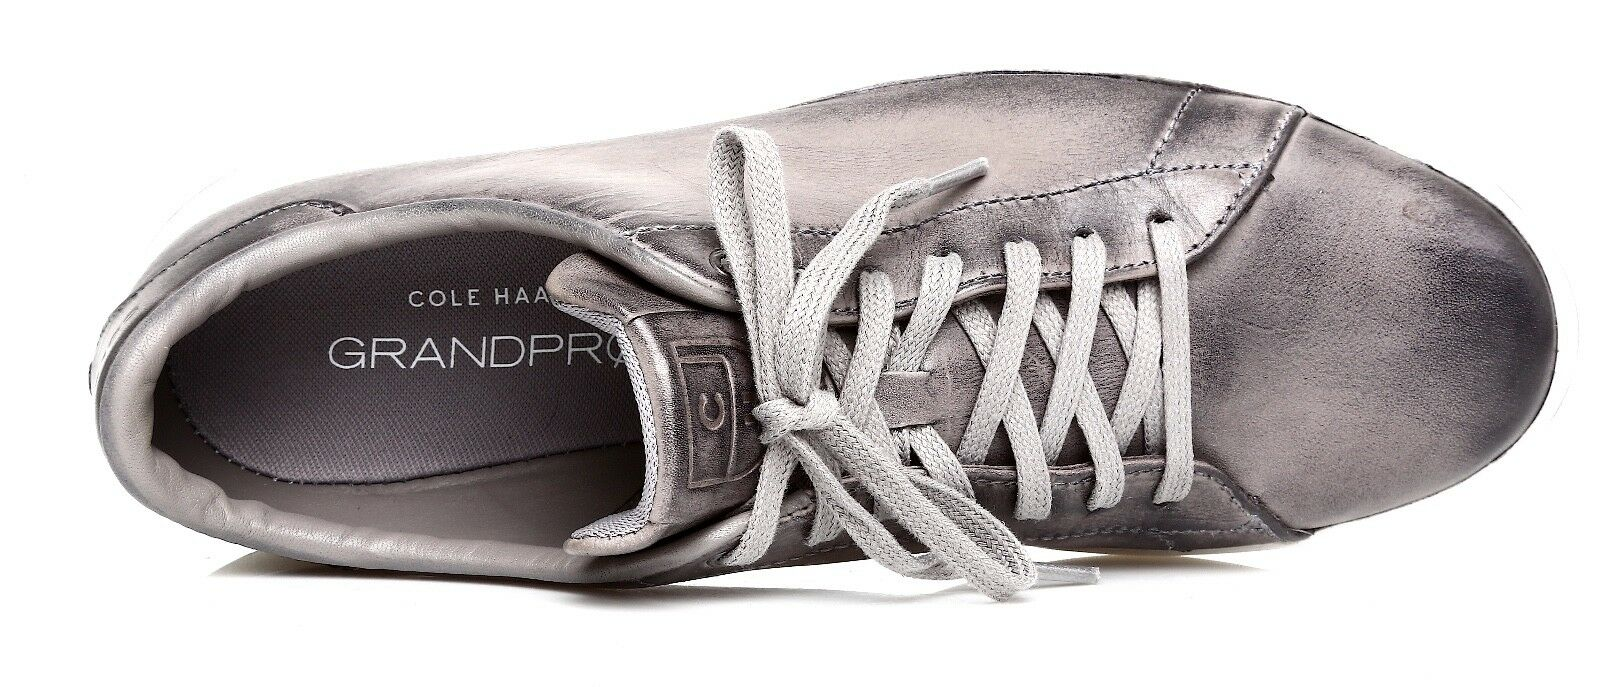 Cole Tennis Haan Uomo Grand Pro Tennis Cole Grey Metallic  Sz 9.5 M 2487 d2cc89